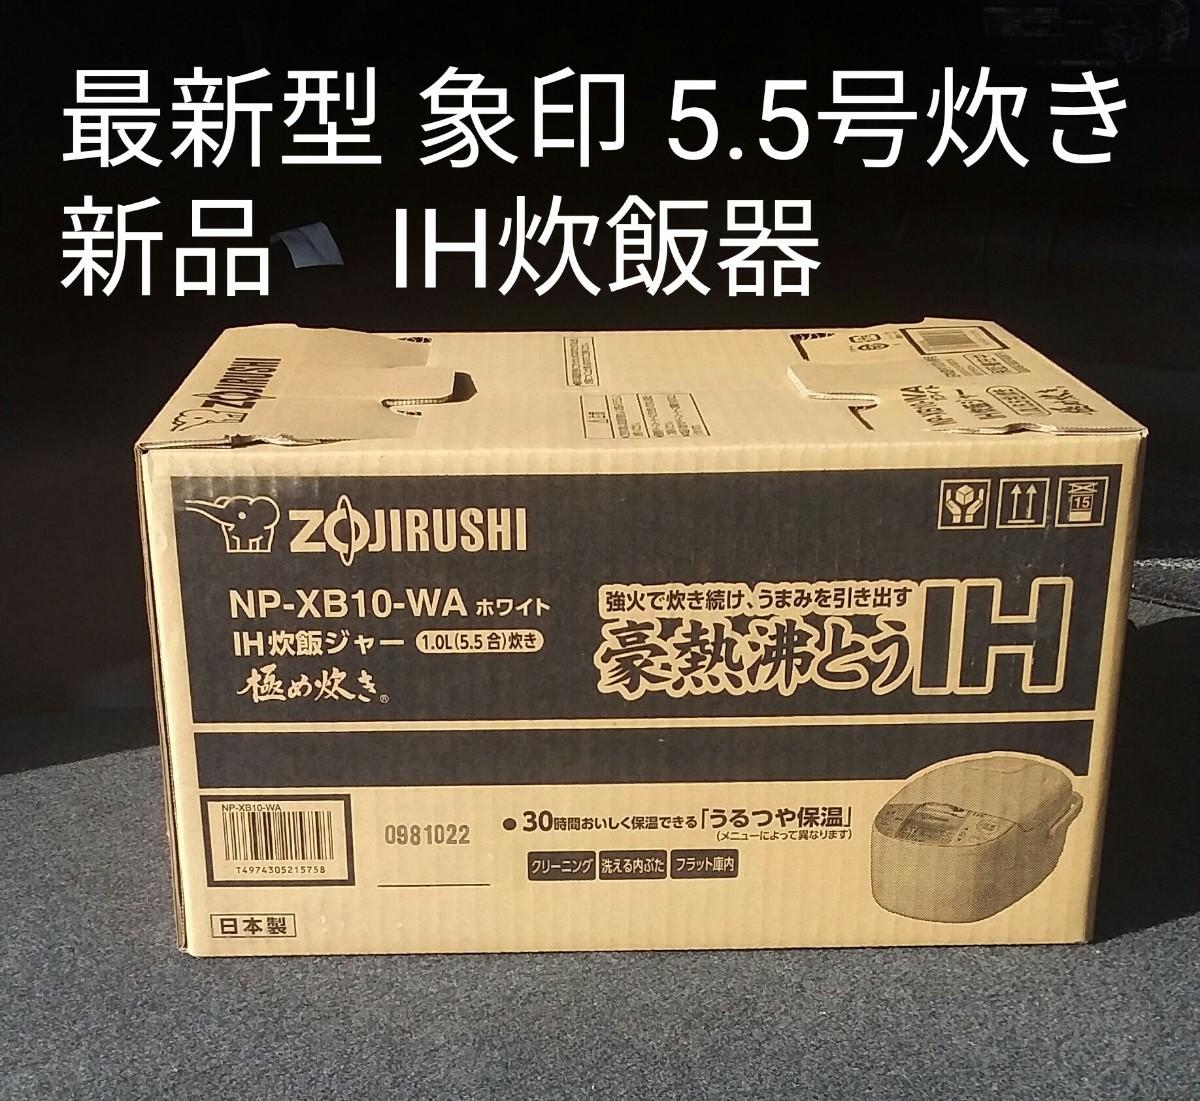 2021年製 新品 最新型 5.5合炊き 象印 ZOJIRUSHI IH炊飯器